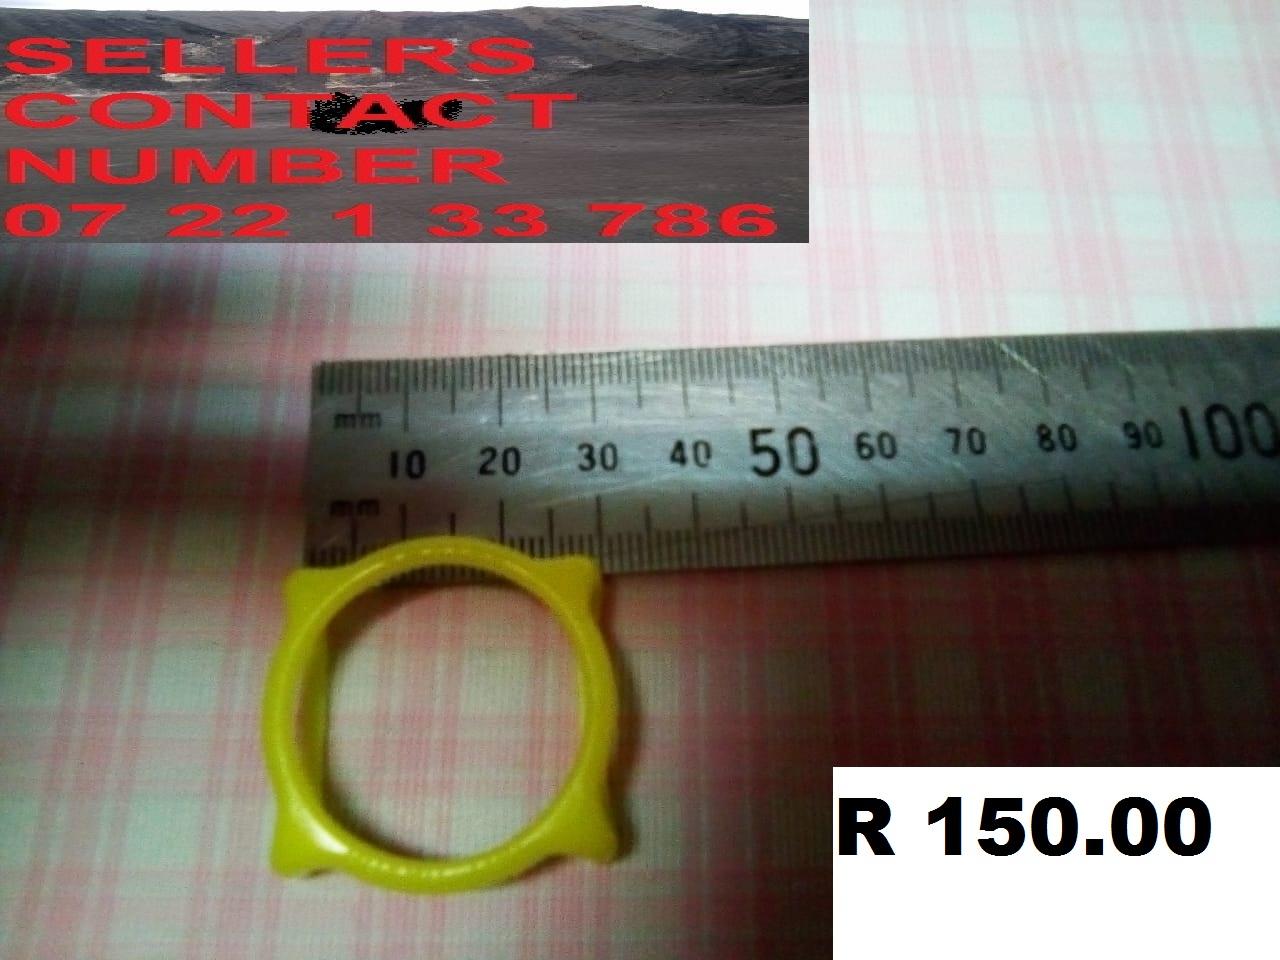 Swatch guard R100